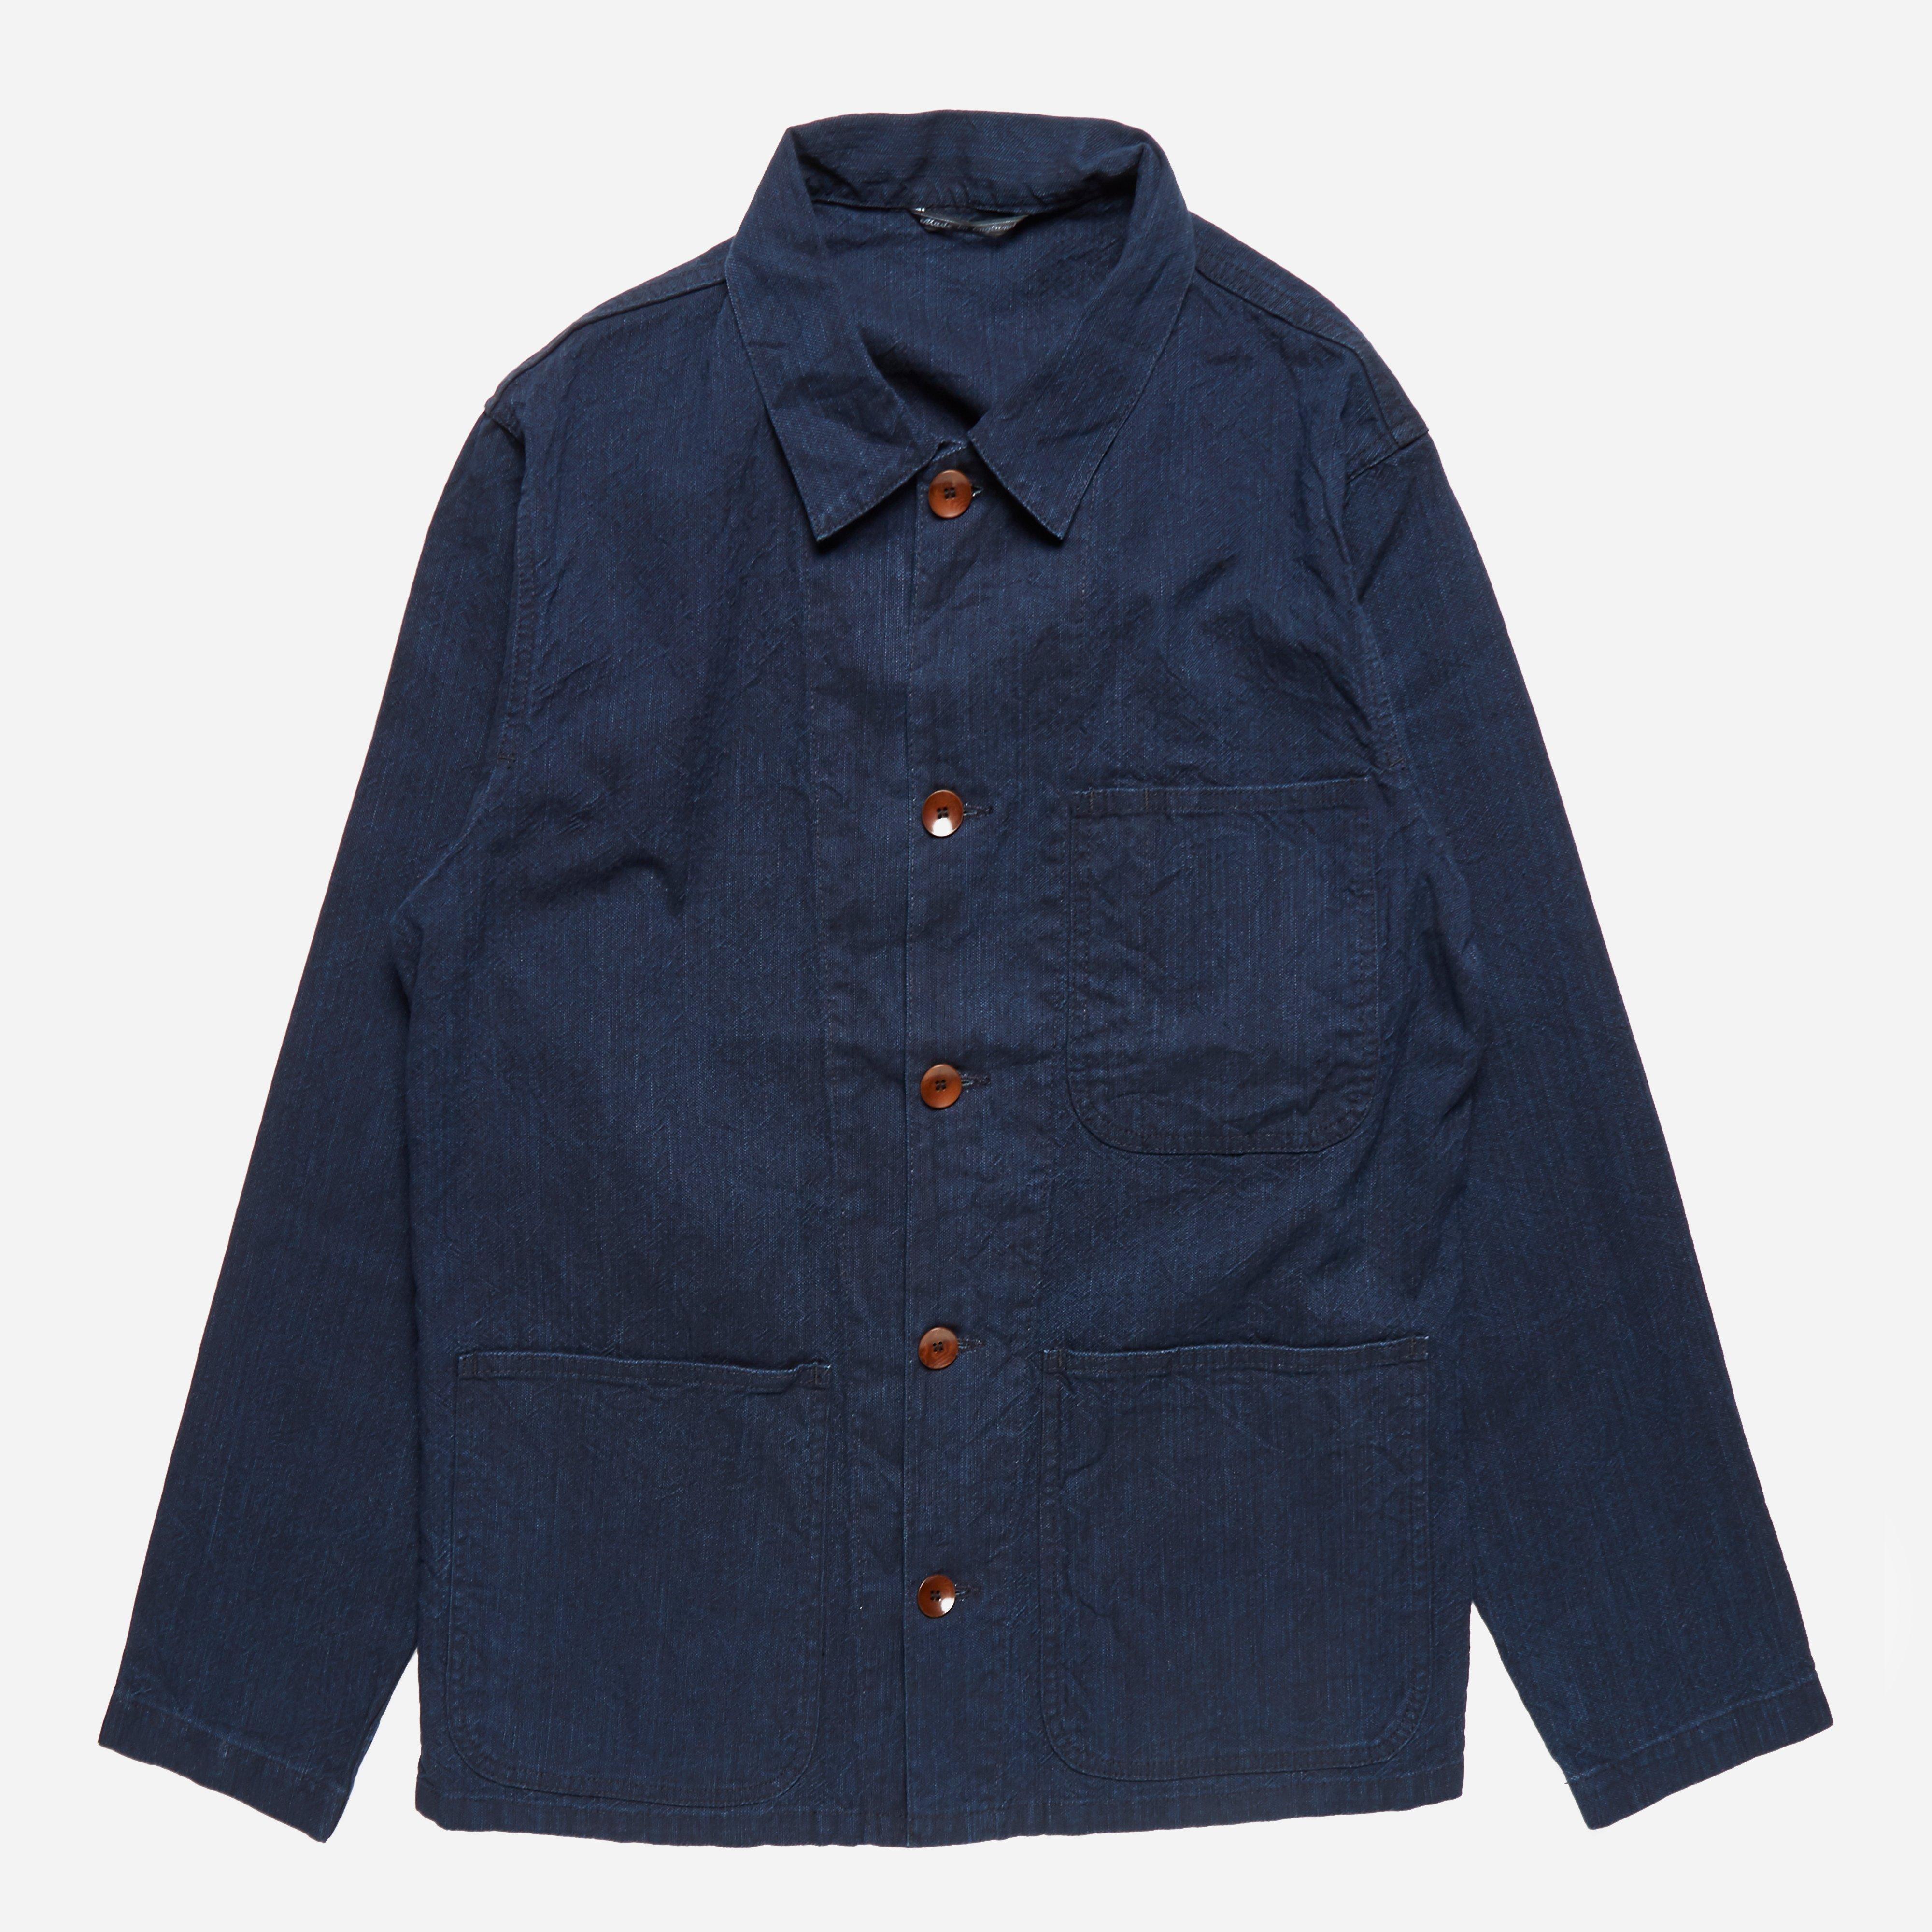 Hawksmill Denim Co. USN Jacket Kimono